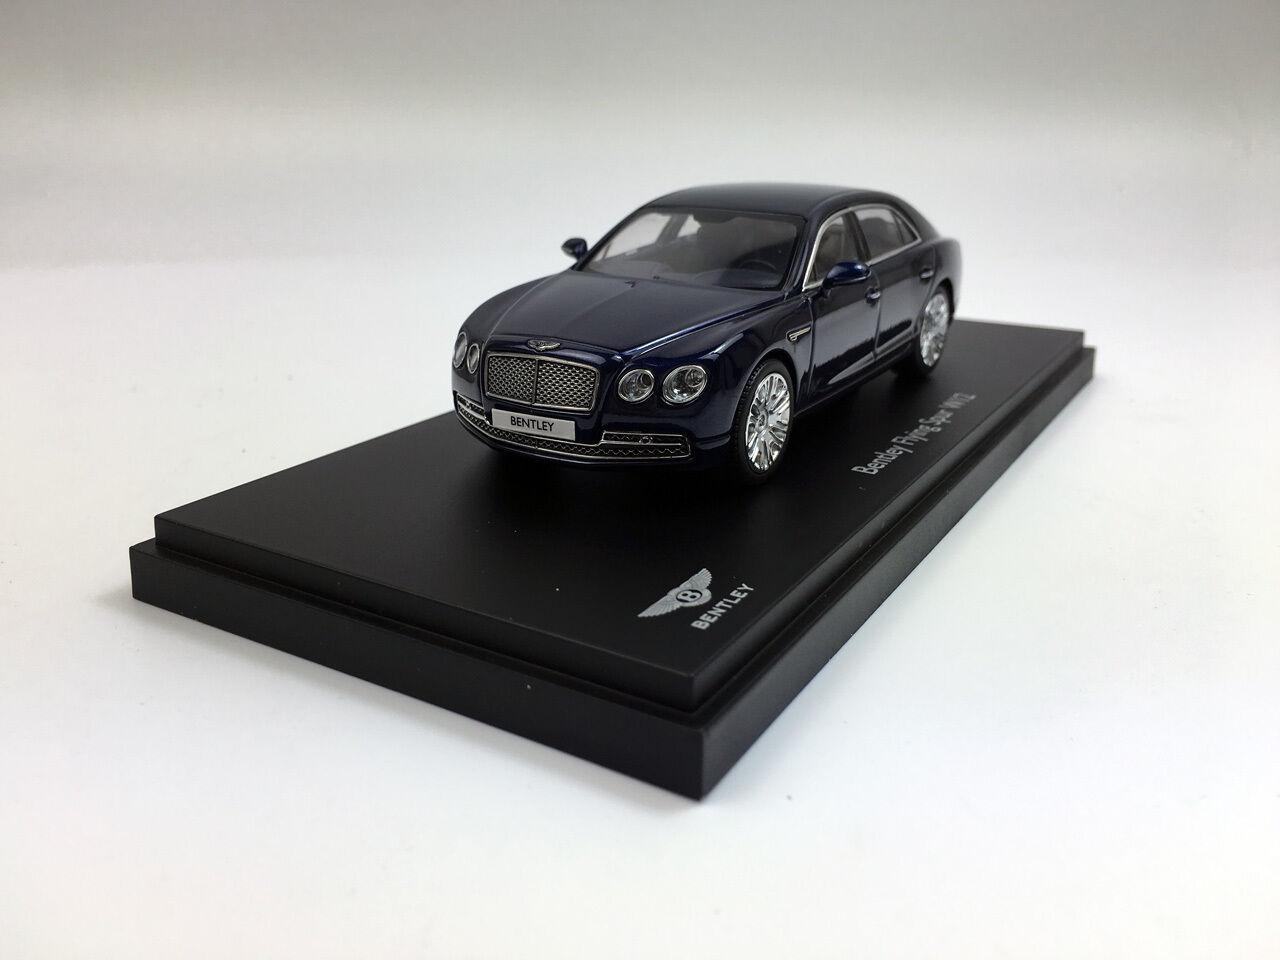 sin mínimo Bentley Flying Spur W12 Kyosho 1 43 Diecast Metal Coche Coche Coche Modelo 05561PC de pavo real  ofrecemos varias marcas famosas